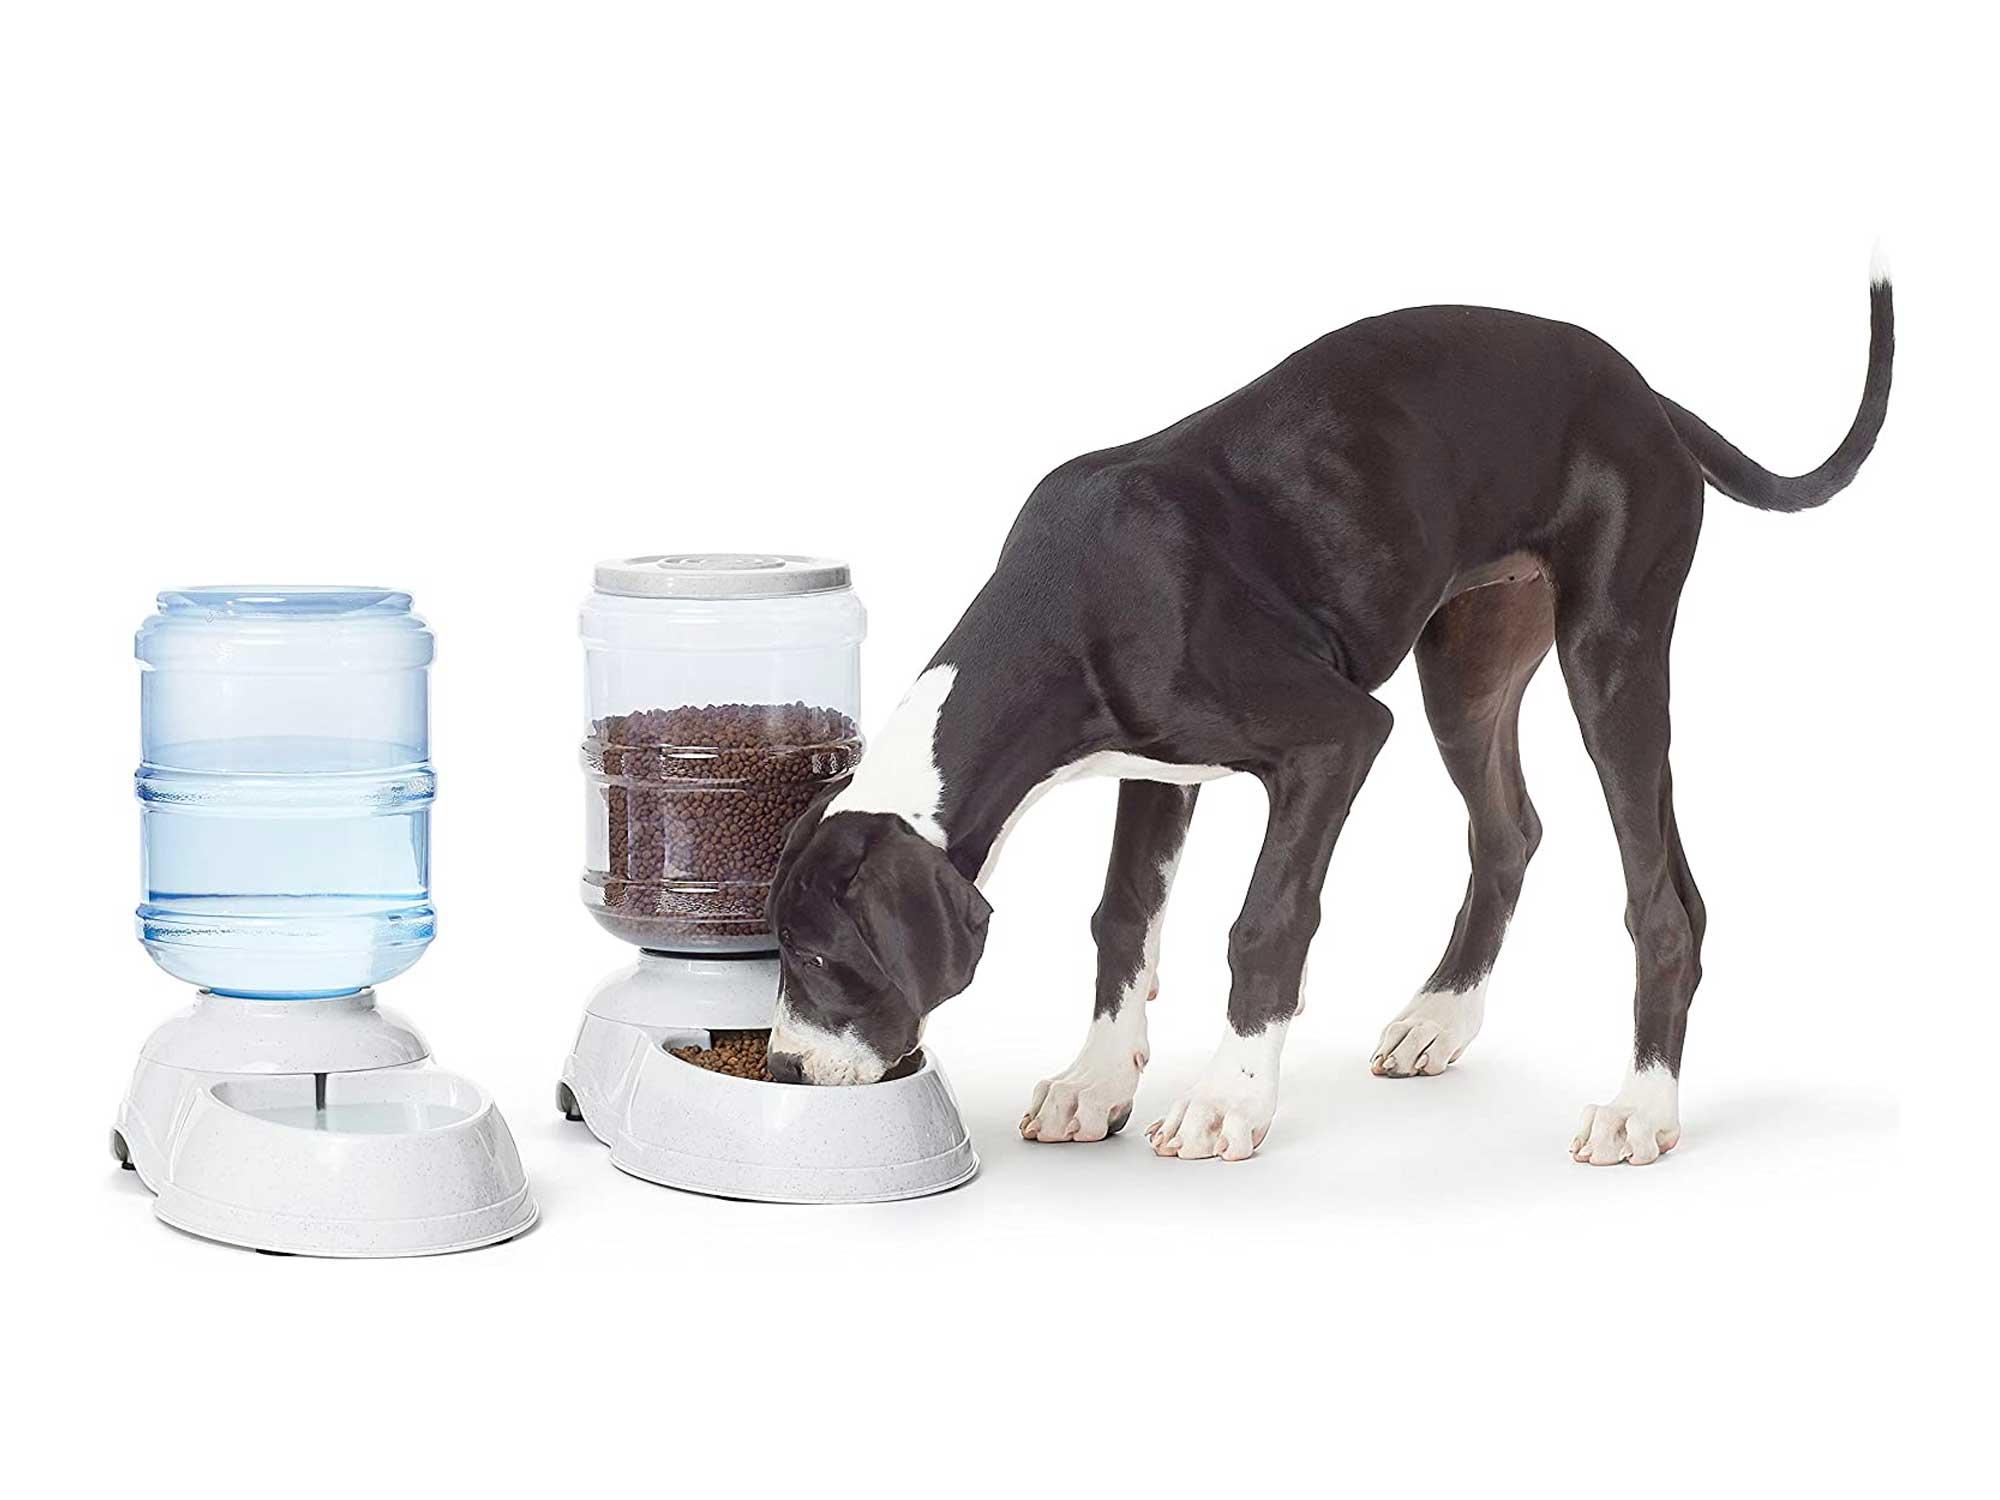 Amazon Basics Gravity Pet Food Feeder and Water Dispenser Bundle, Large